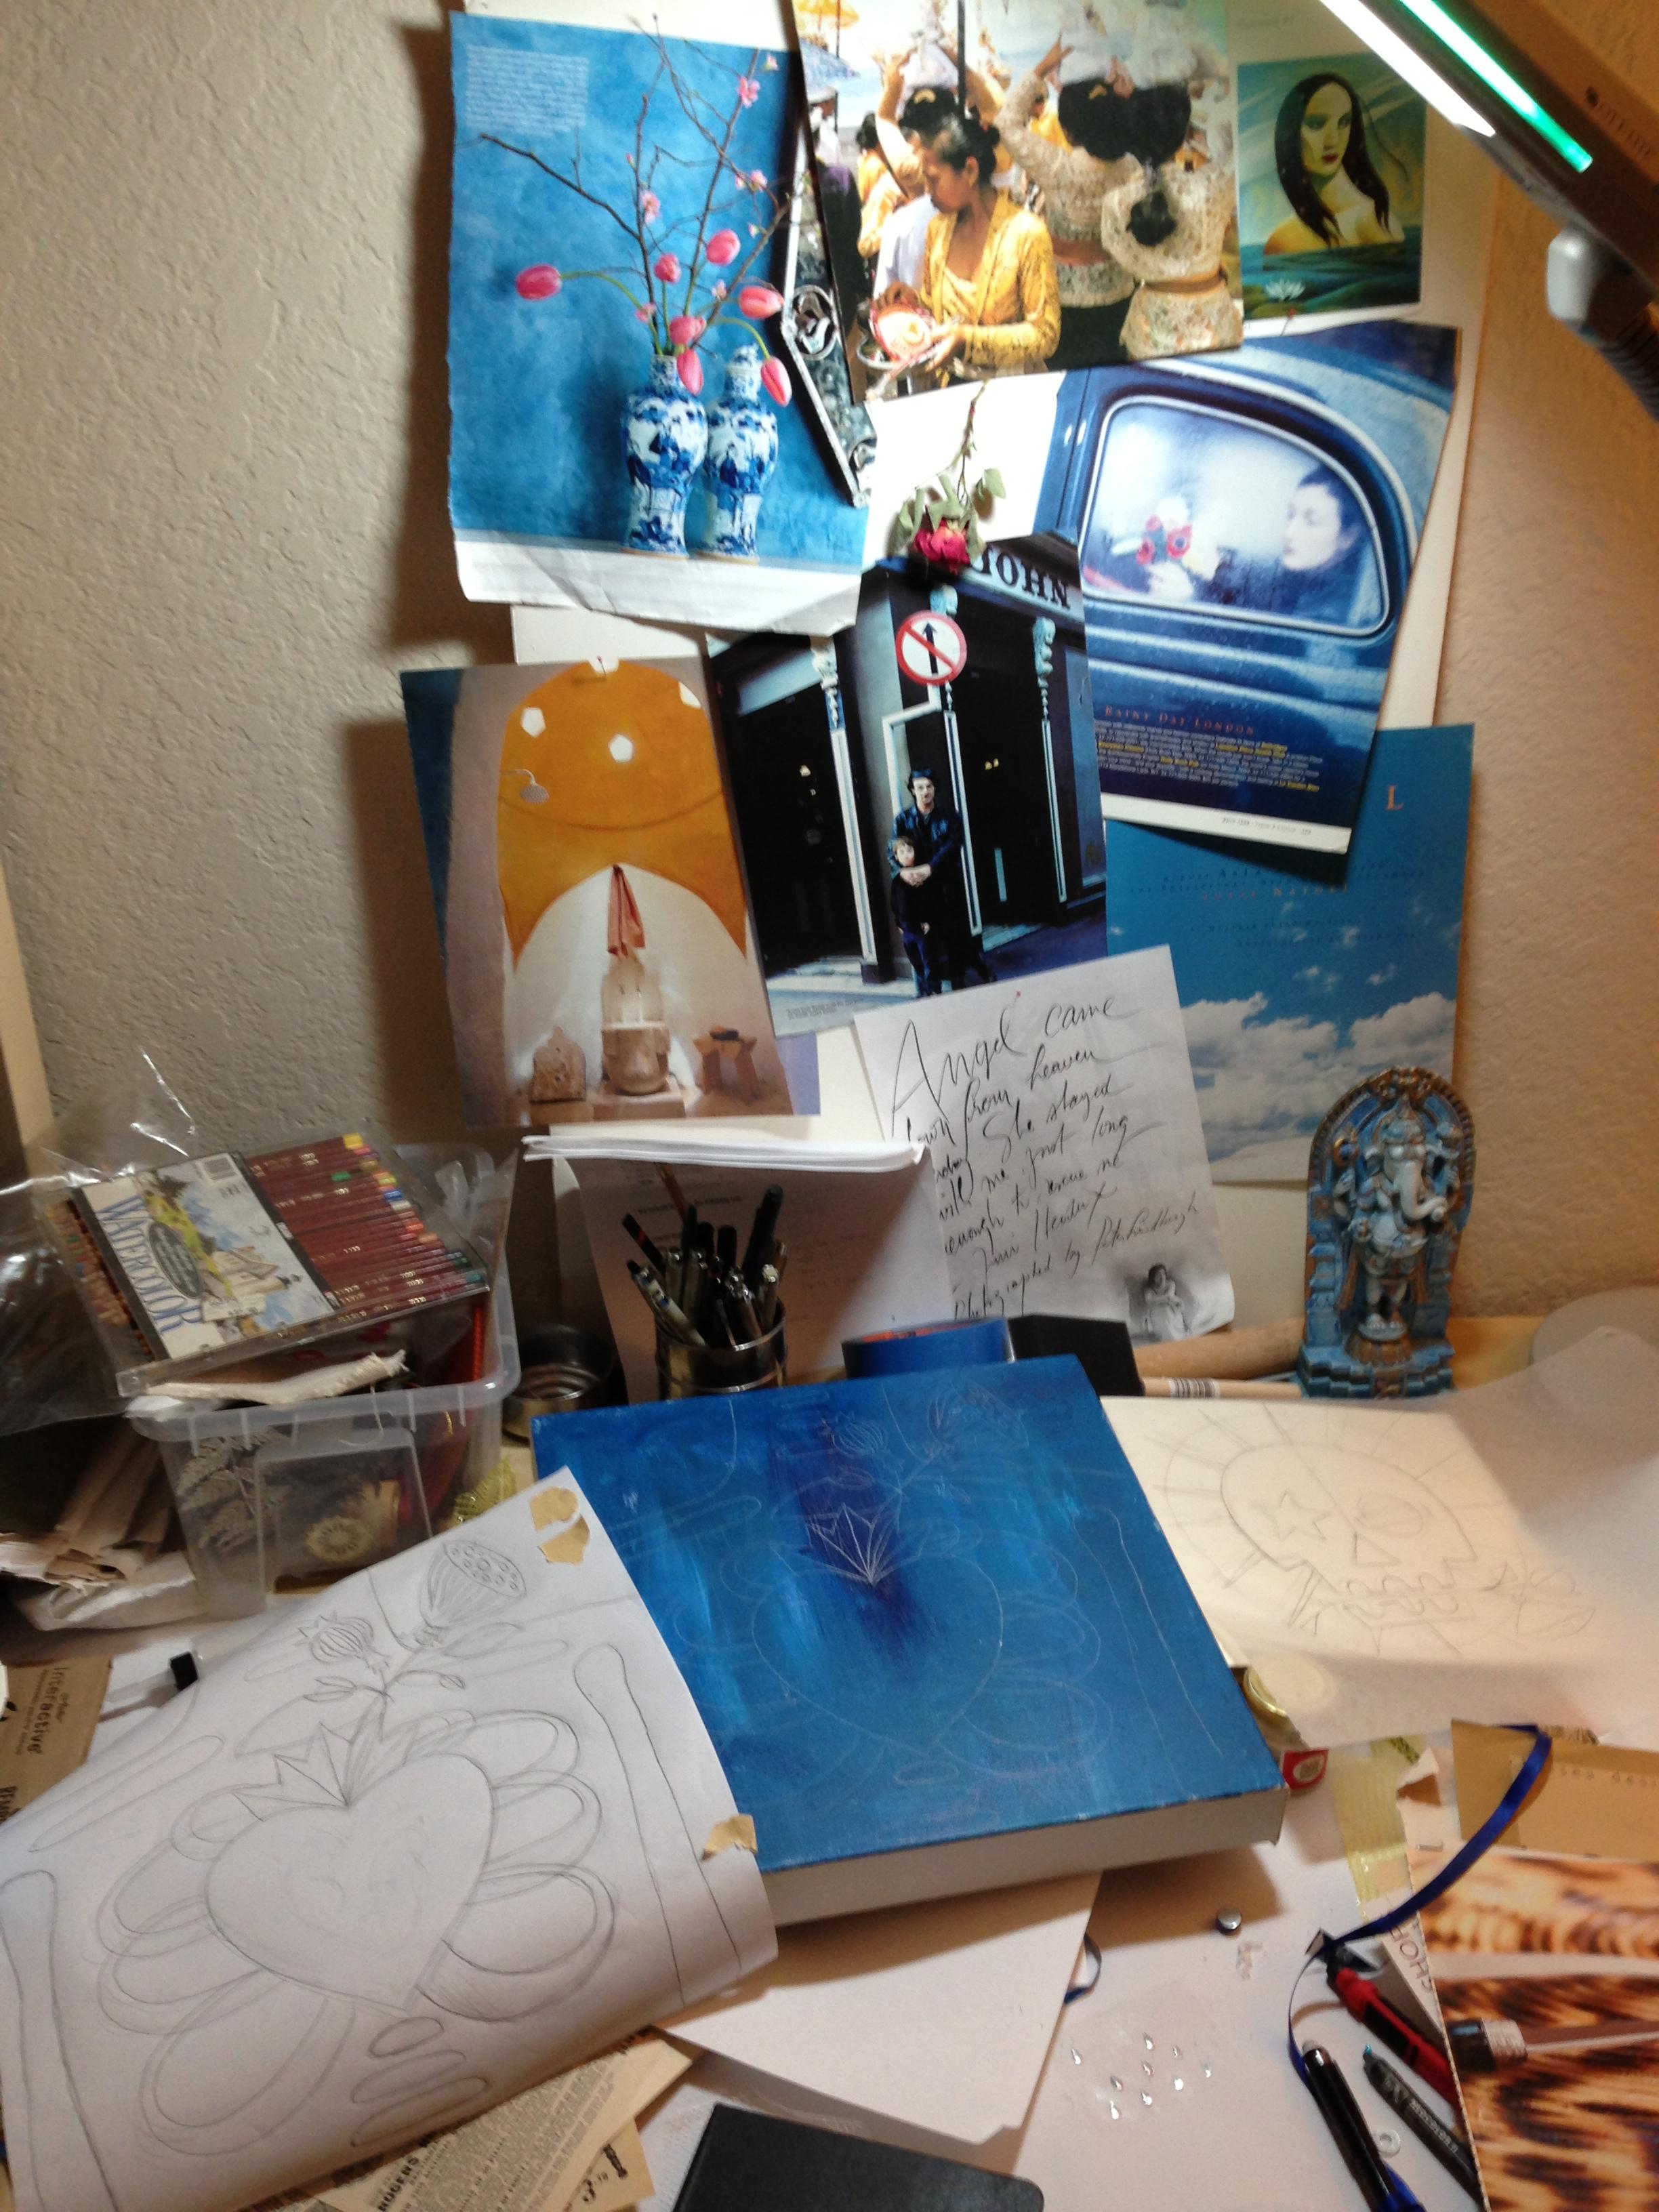 Mood board and drawing